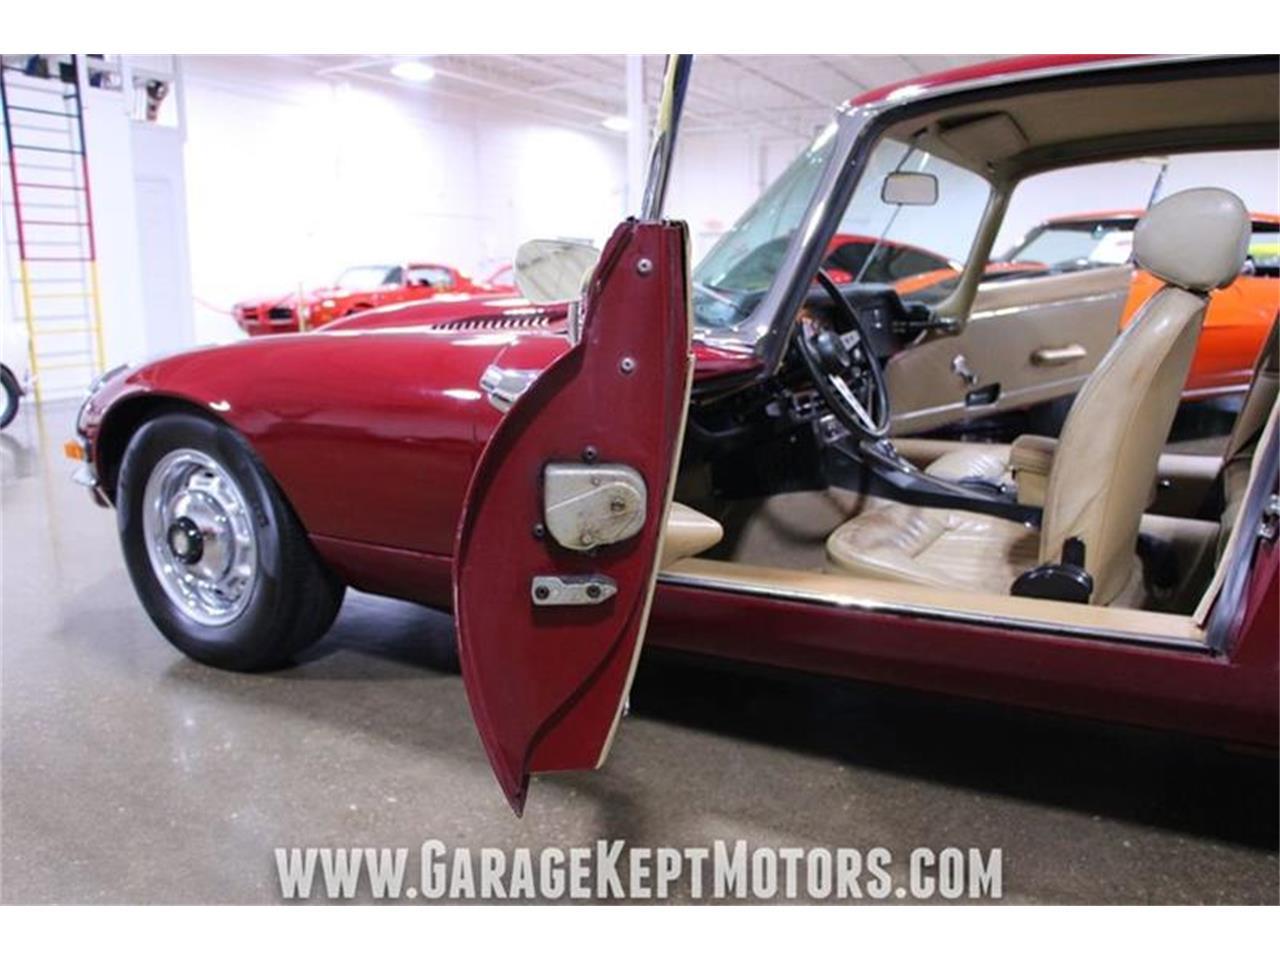 Large Picture of Classic '71 Jaguar E-Type - $62,900.00 Offered by Garage Kept Motors - QP0V